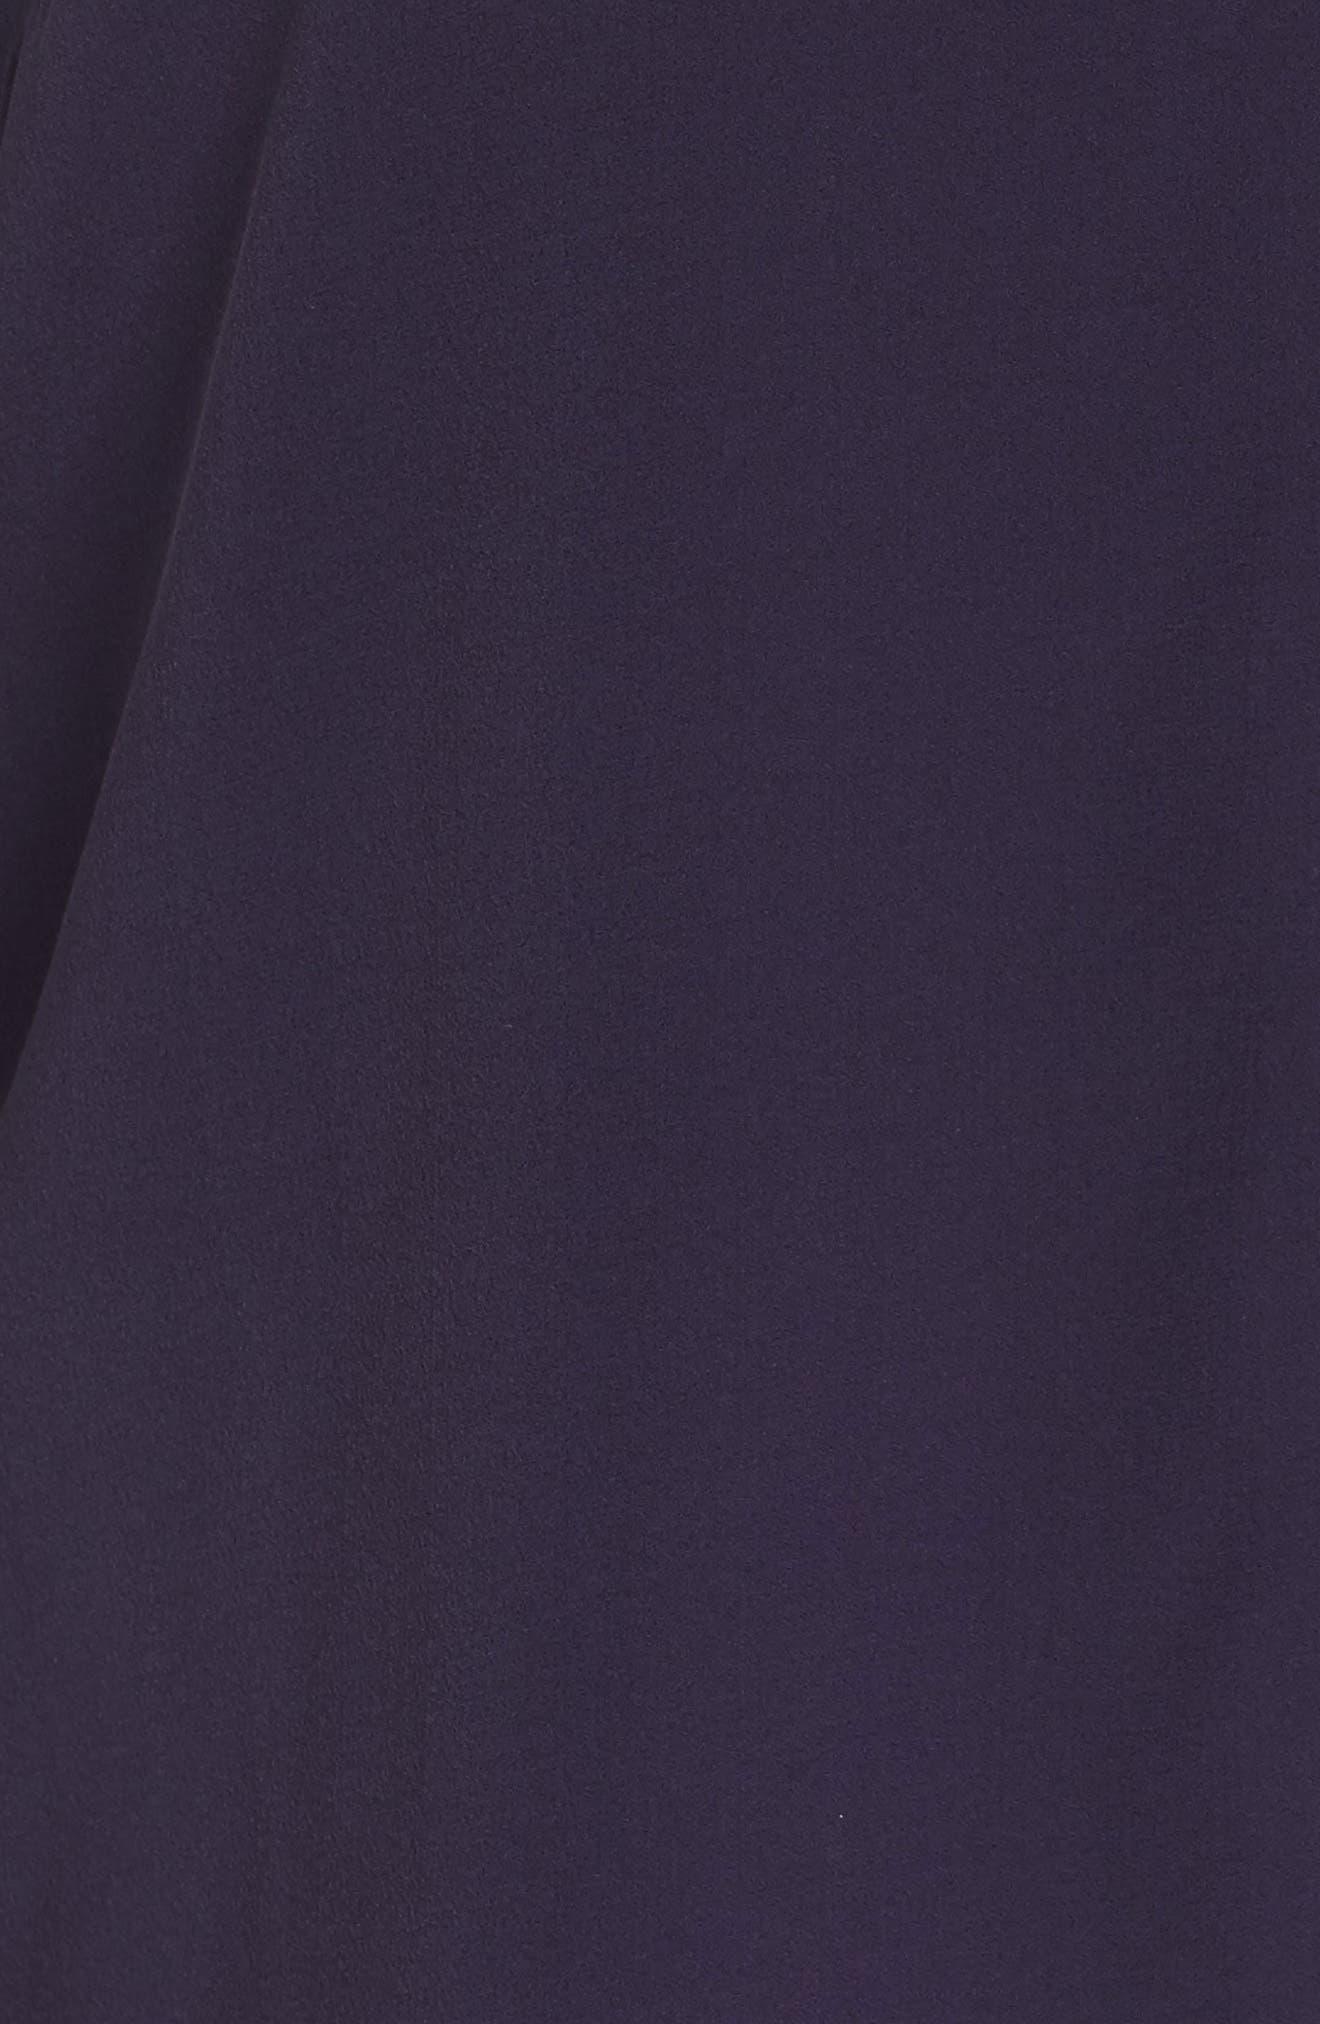 Piping V-Neck Silk Shirt,                             Alternate thumbnail 5, color,                             Salt Lake